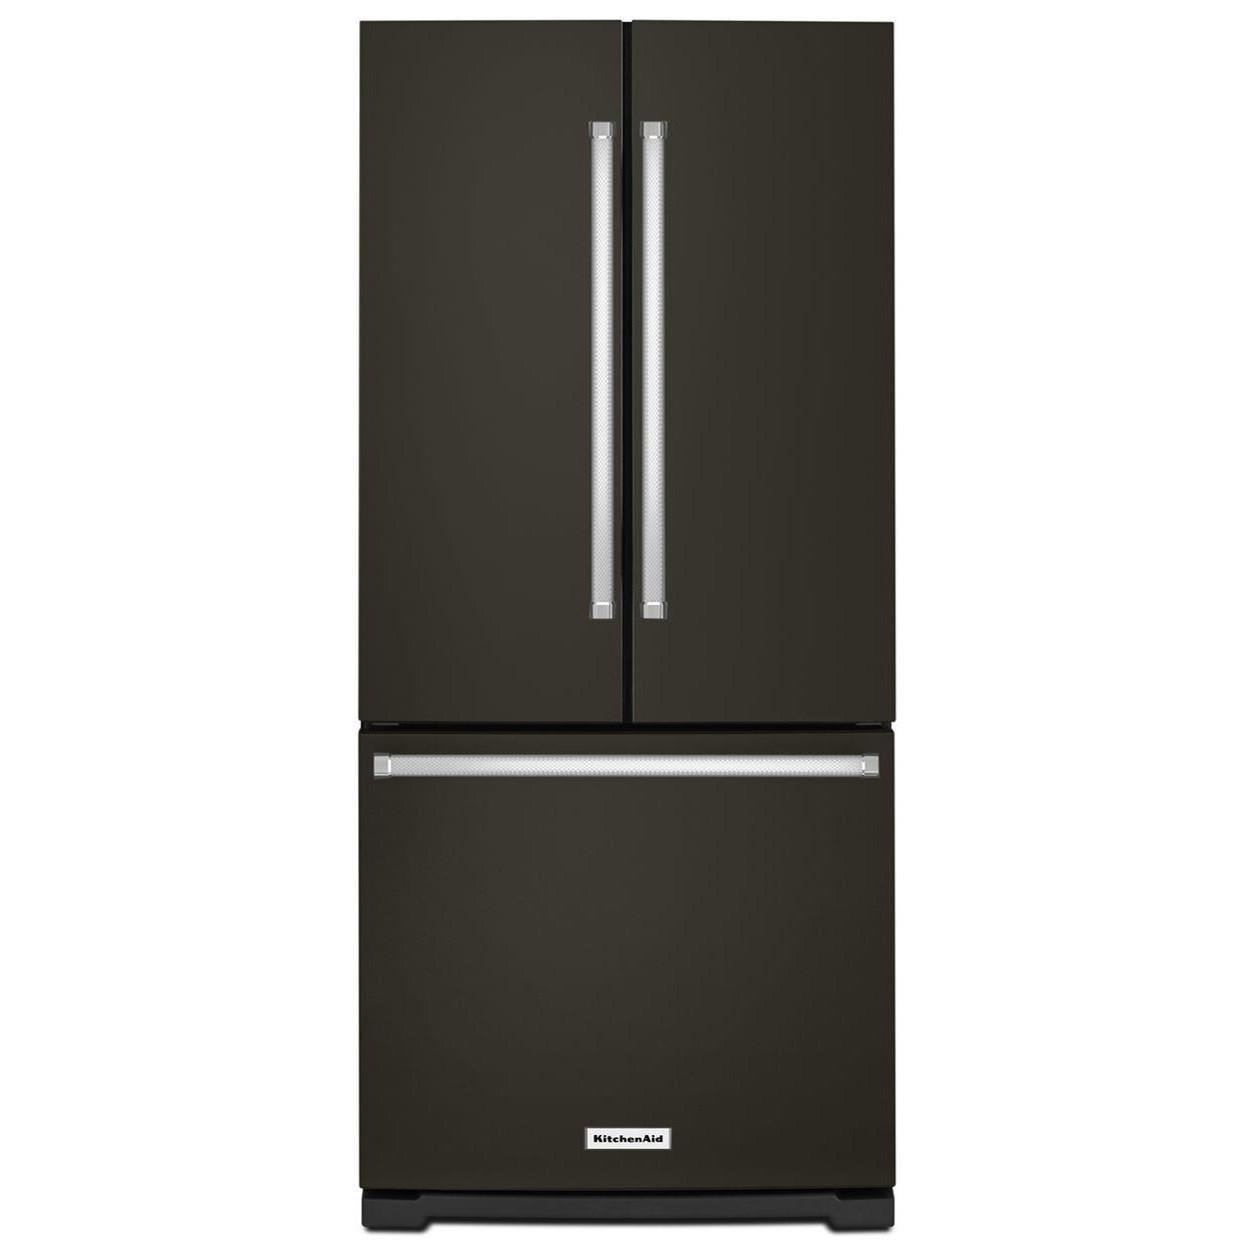 Kitchenaid Krff300ebs20 Cu Ft 30 Inch Width Standard Depth French Door Refrigerator With